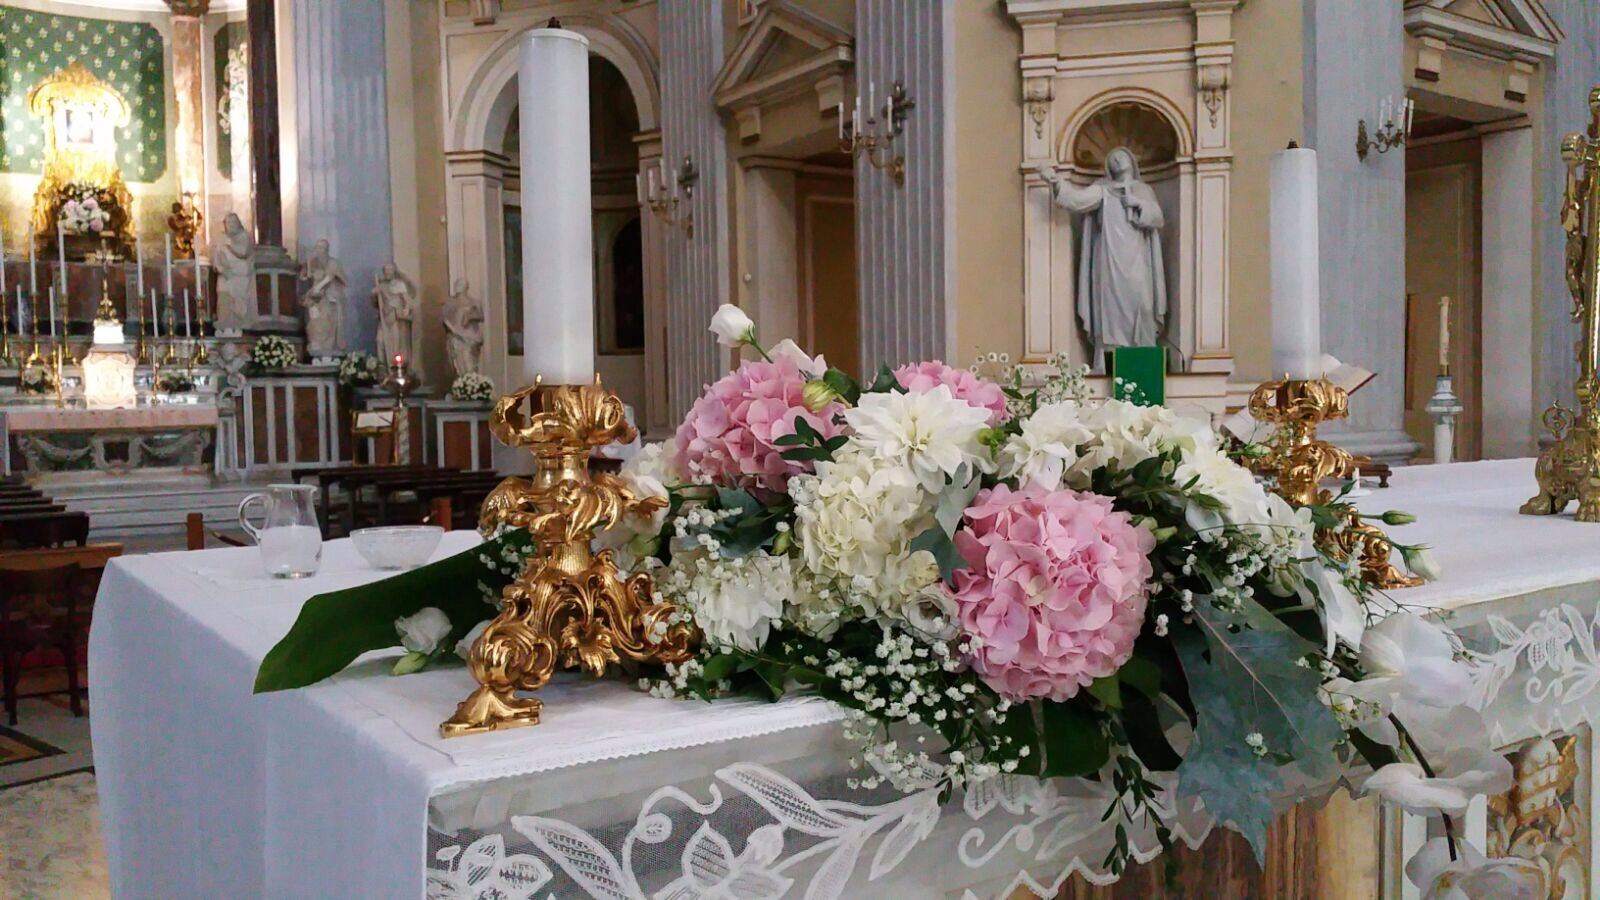 http://www.weddingamalfi.com/wp-content/uploads/Domenico-and-Maria-Wedding-Amalfi-church-flowers-decoration.jpg